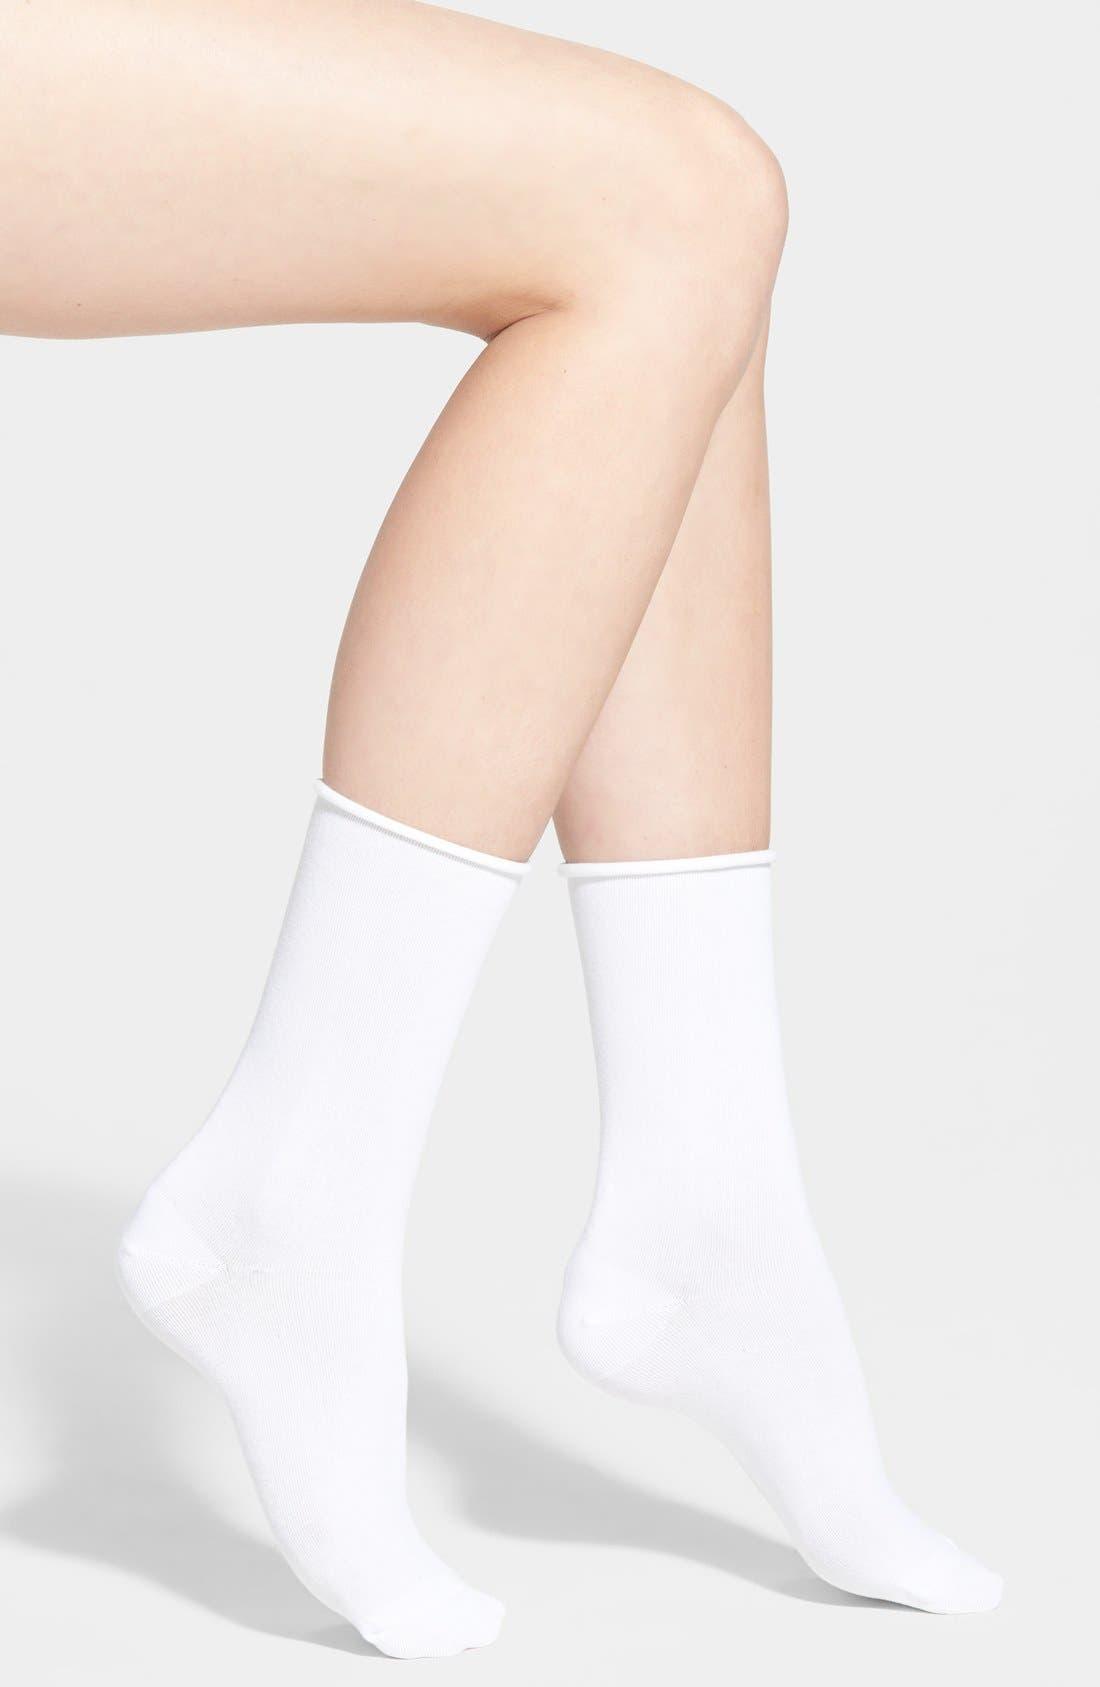 Alternate Image 1 Selected - Hue 'Jeans' Socks (3 for $18)